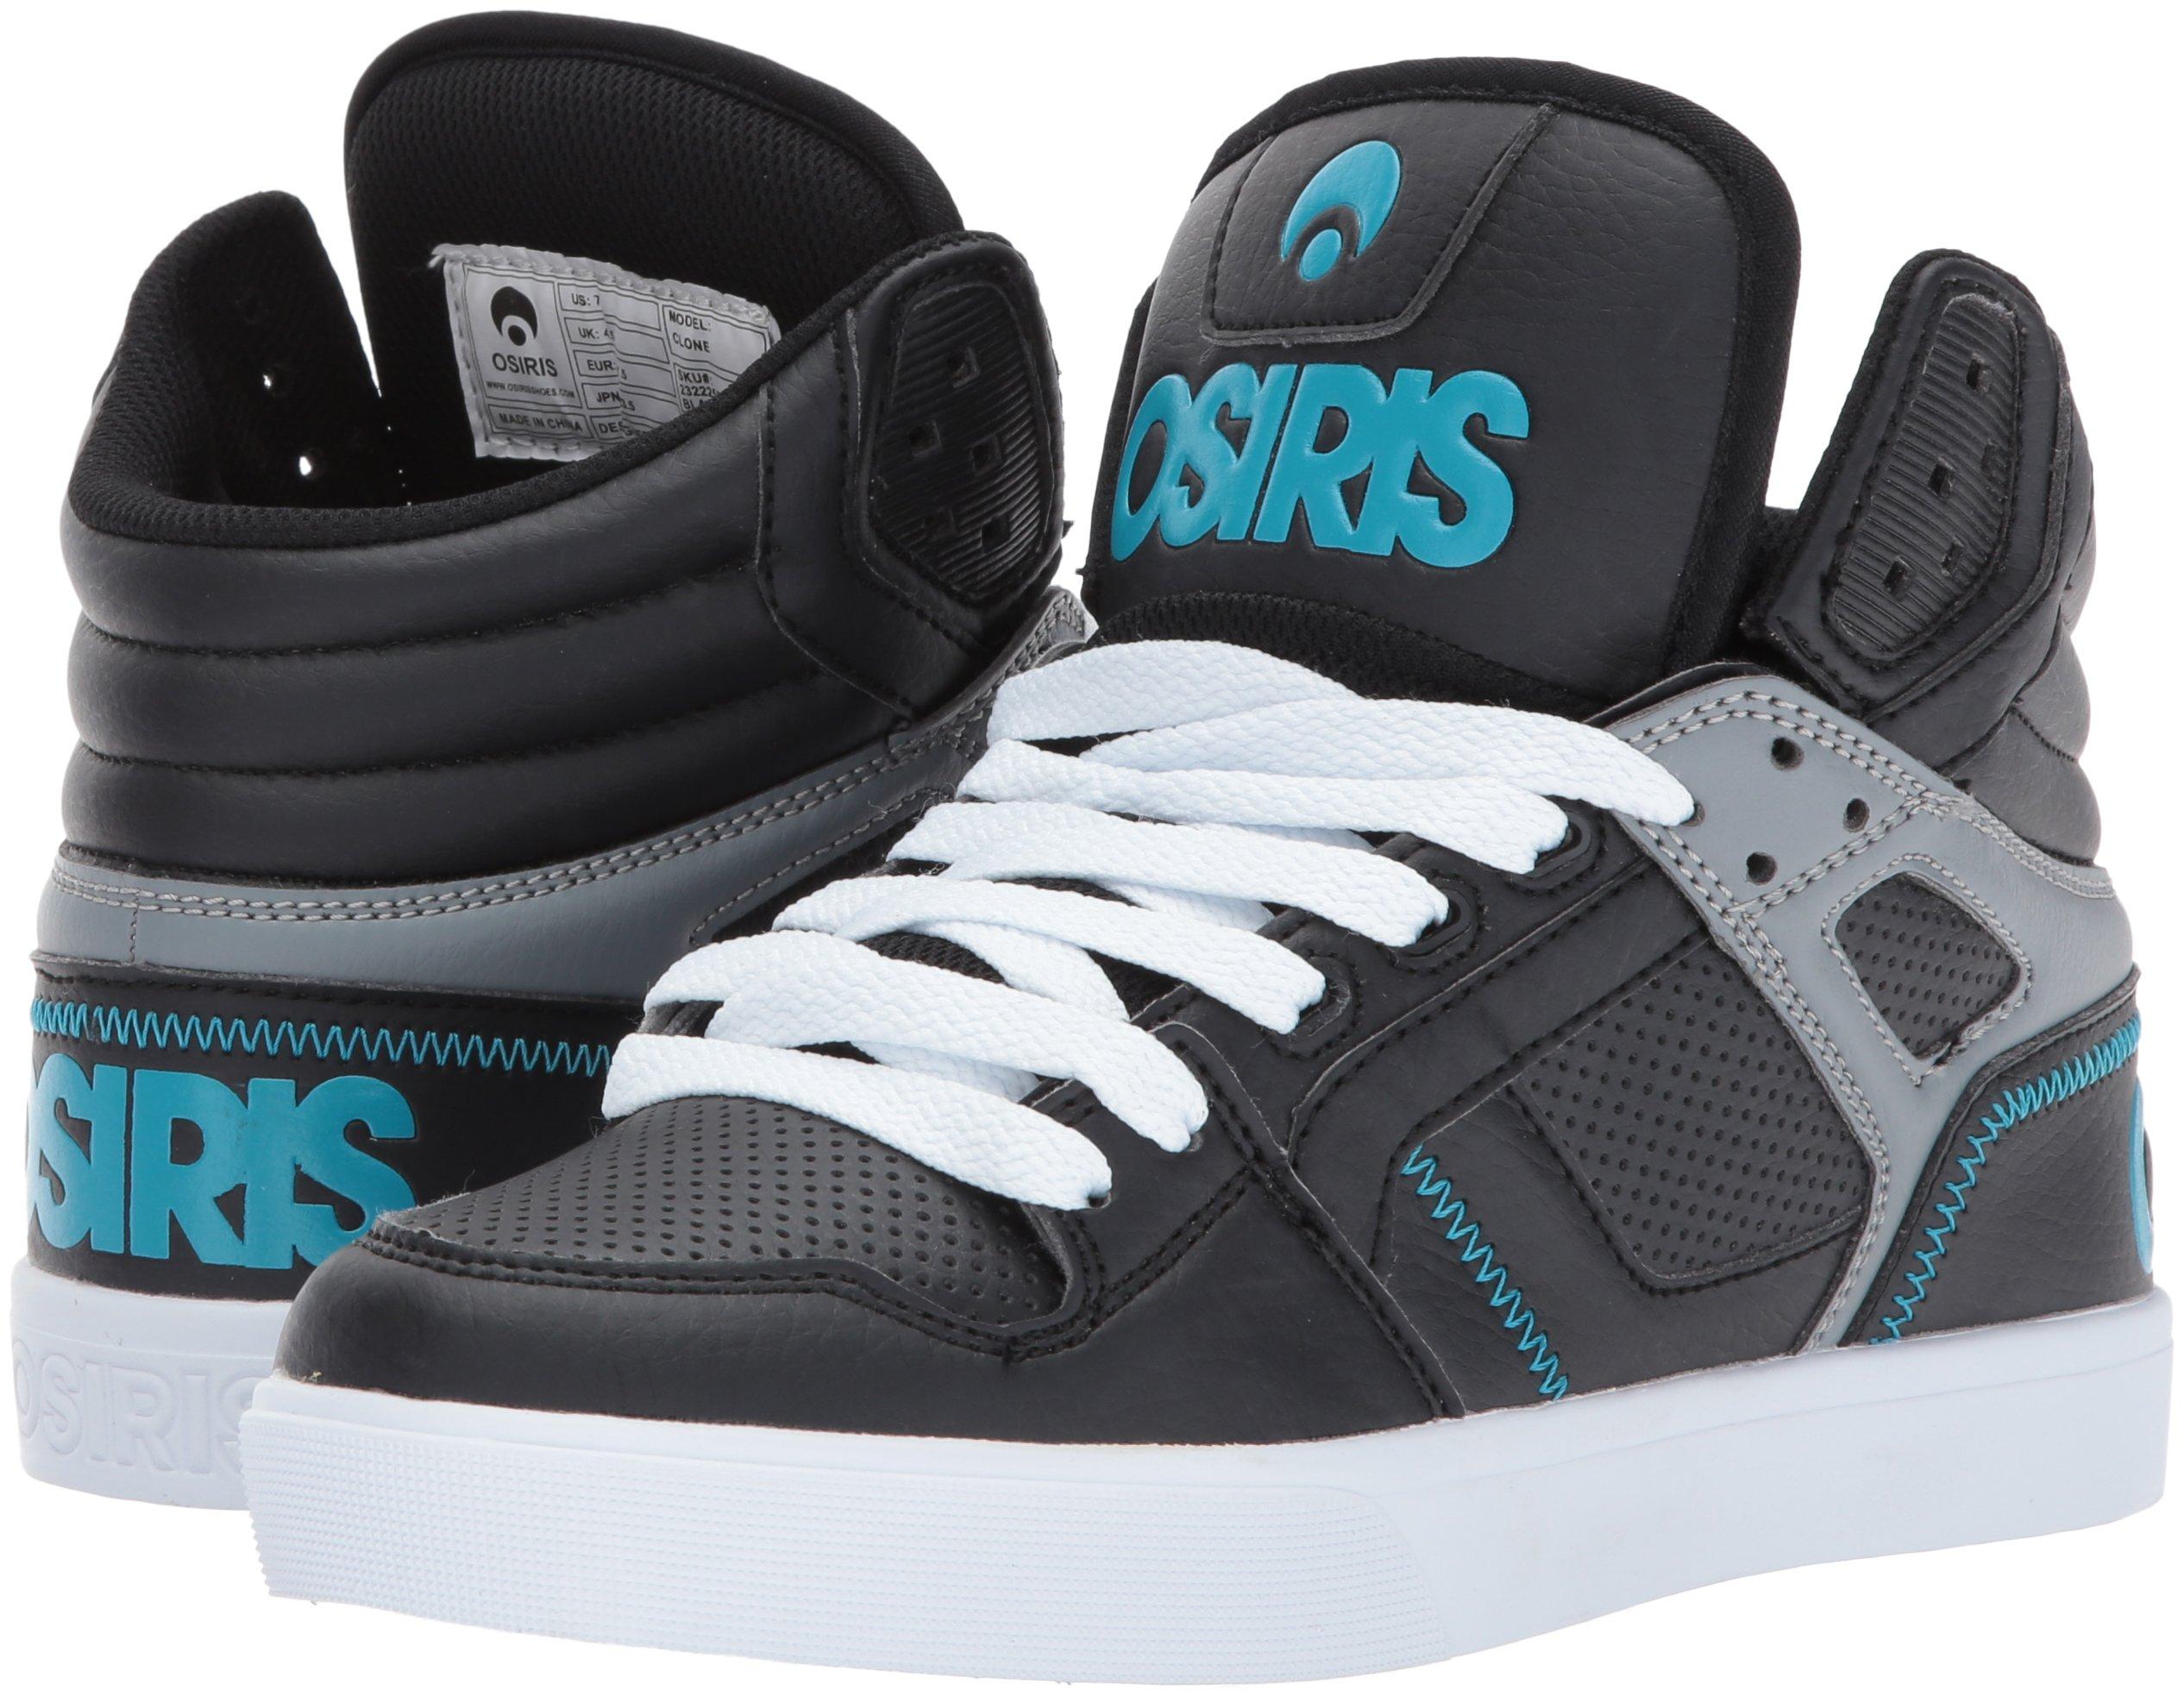 Osiris Women's Clone Skate Shoe- Buy